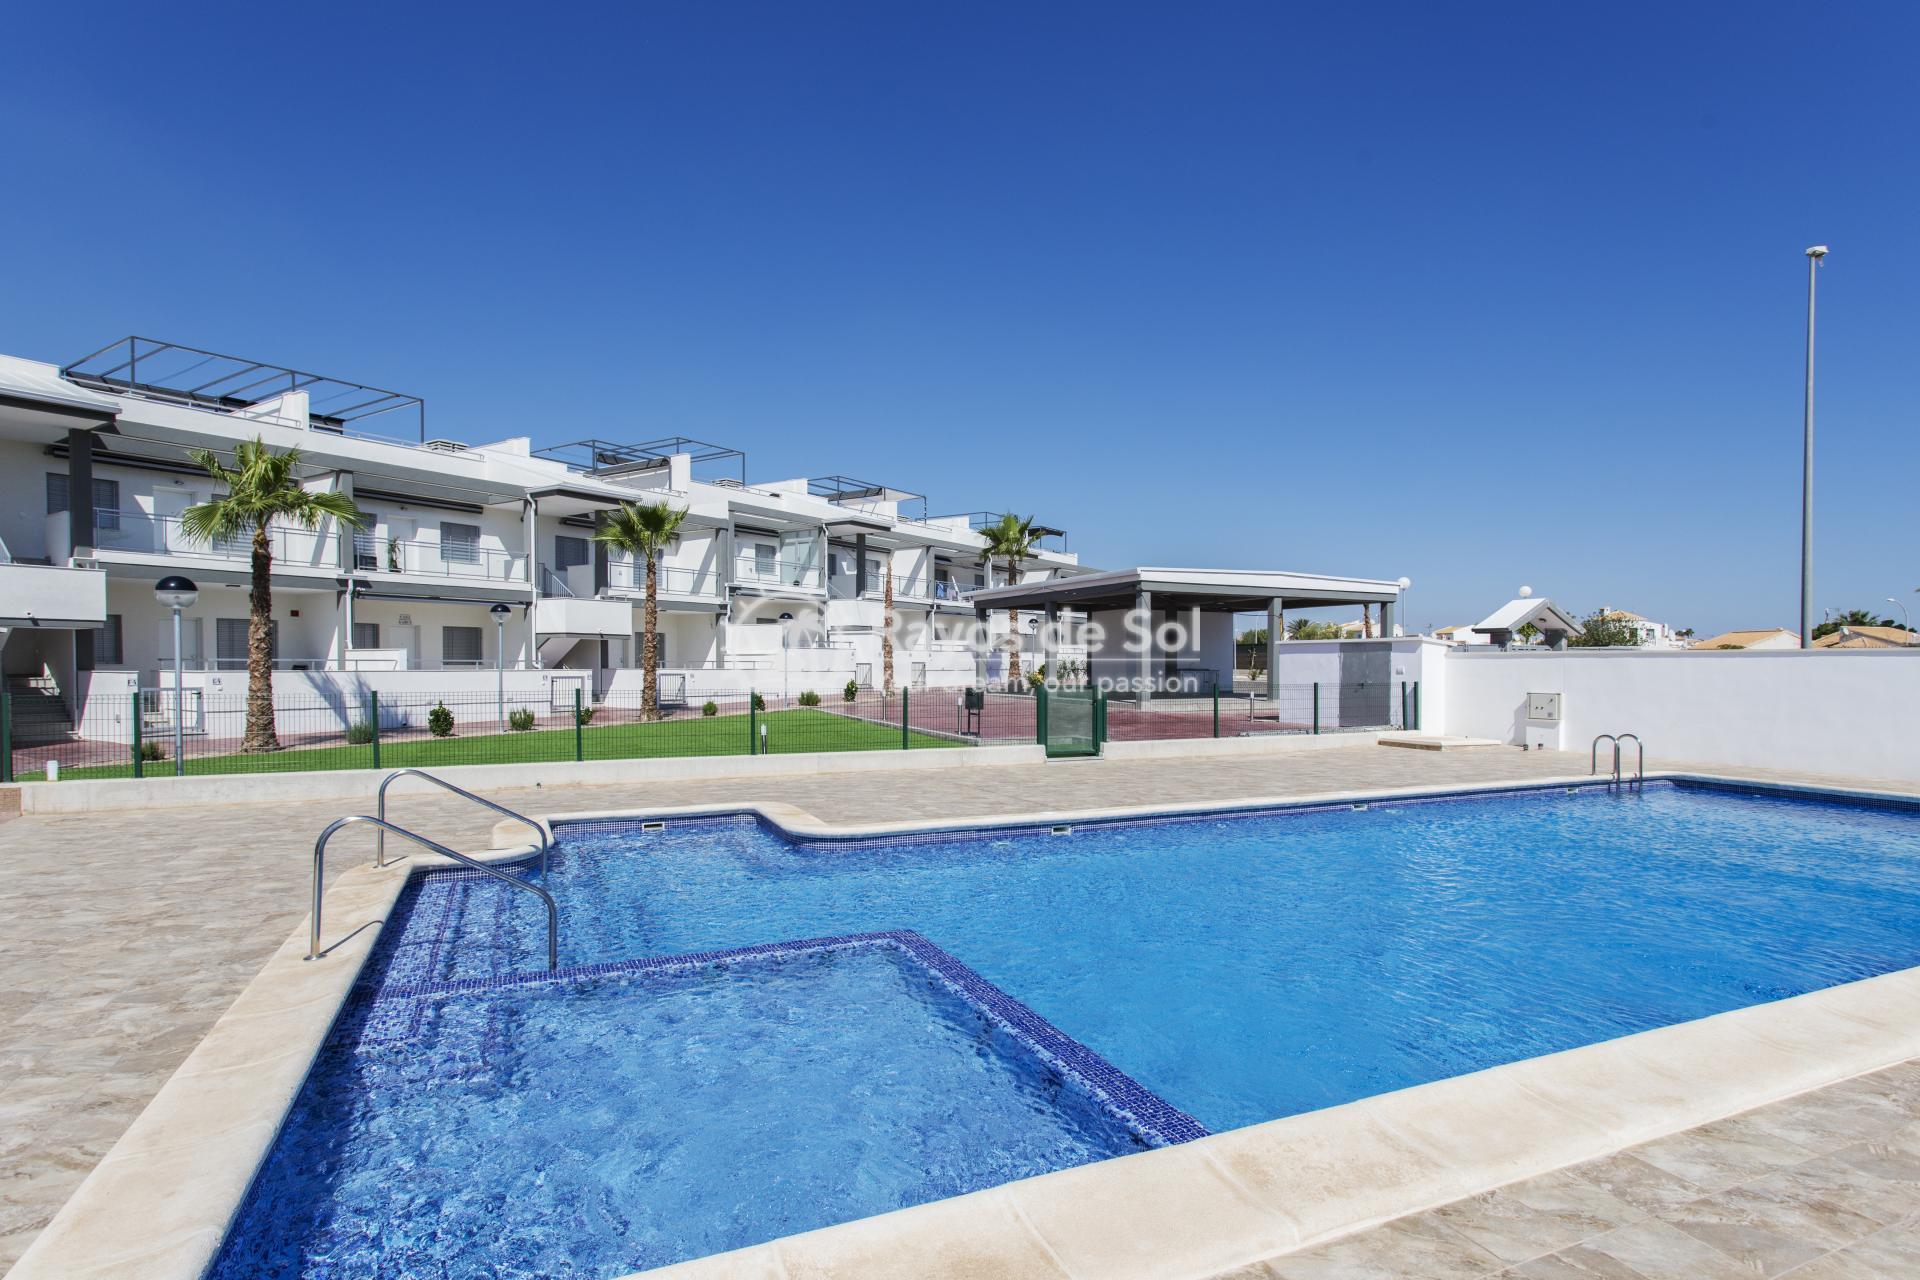 Appartement begane grond  in La Florida, Orihuela Costa, Costa Blanca (Oasis place BG3-2) - 23